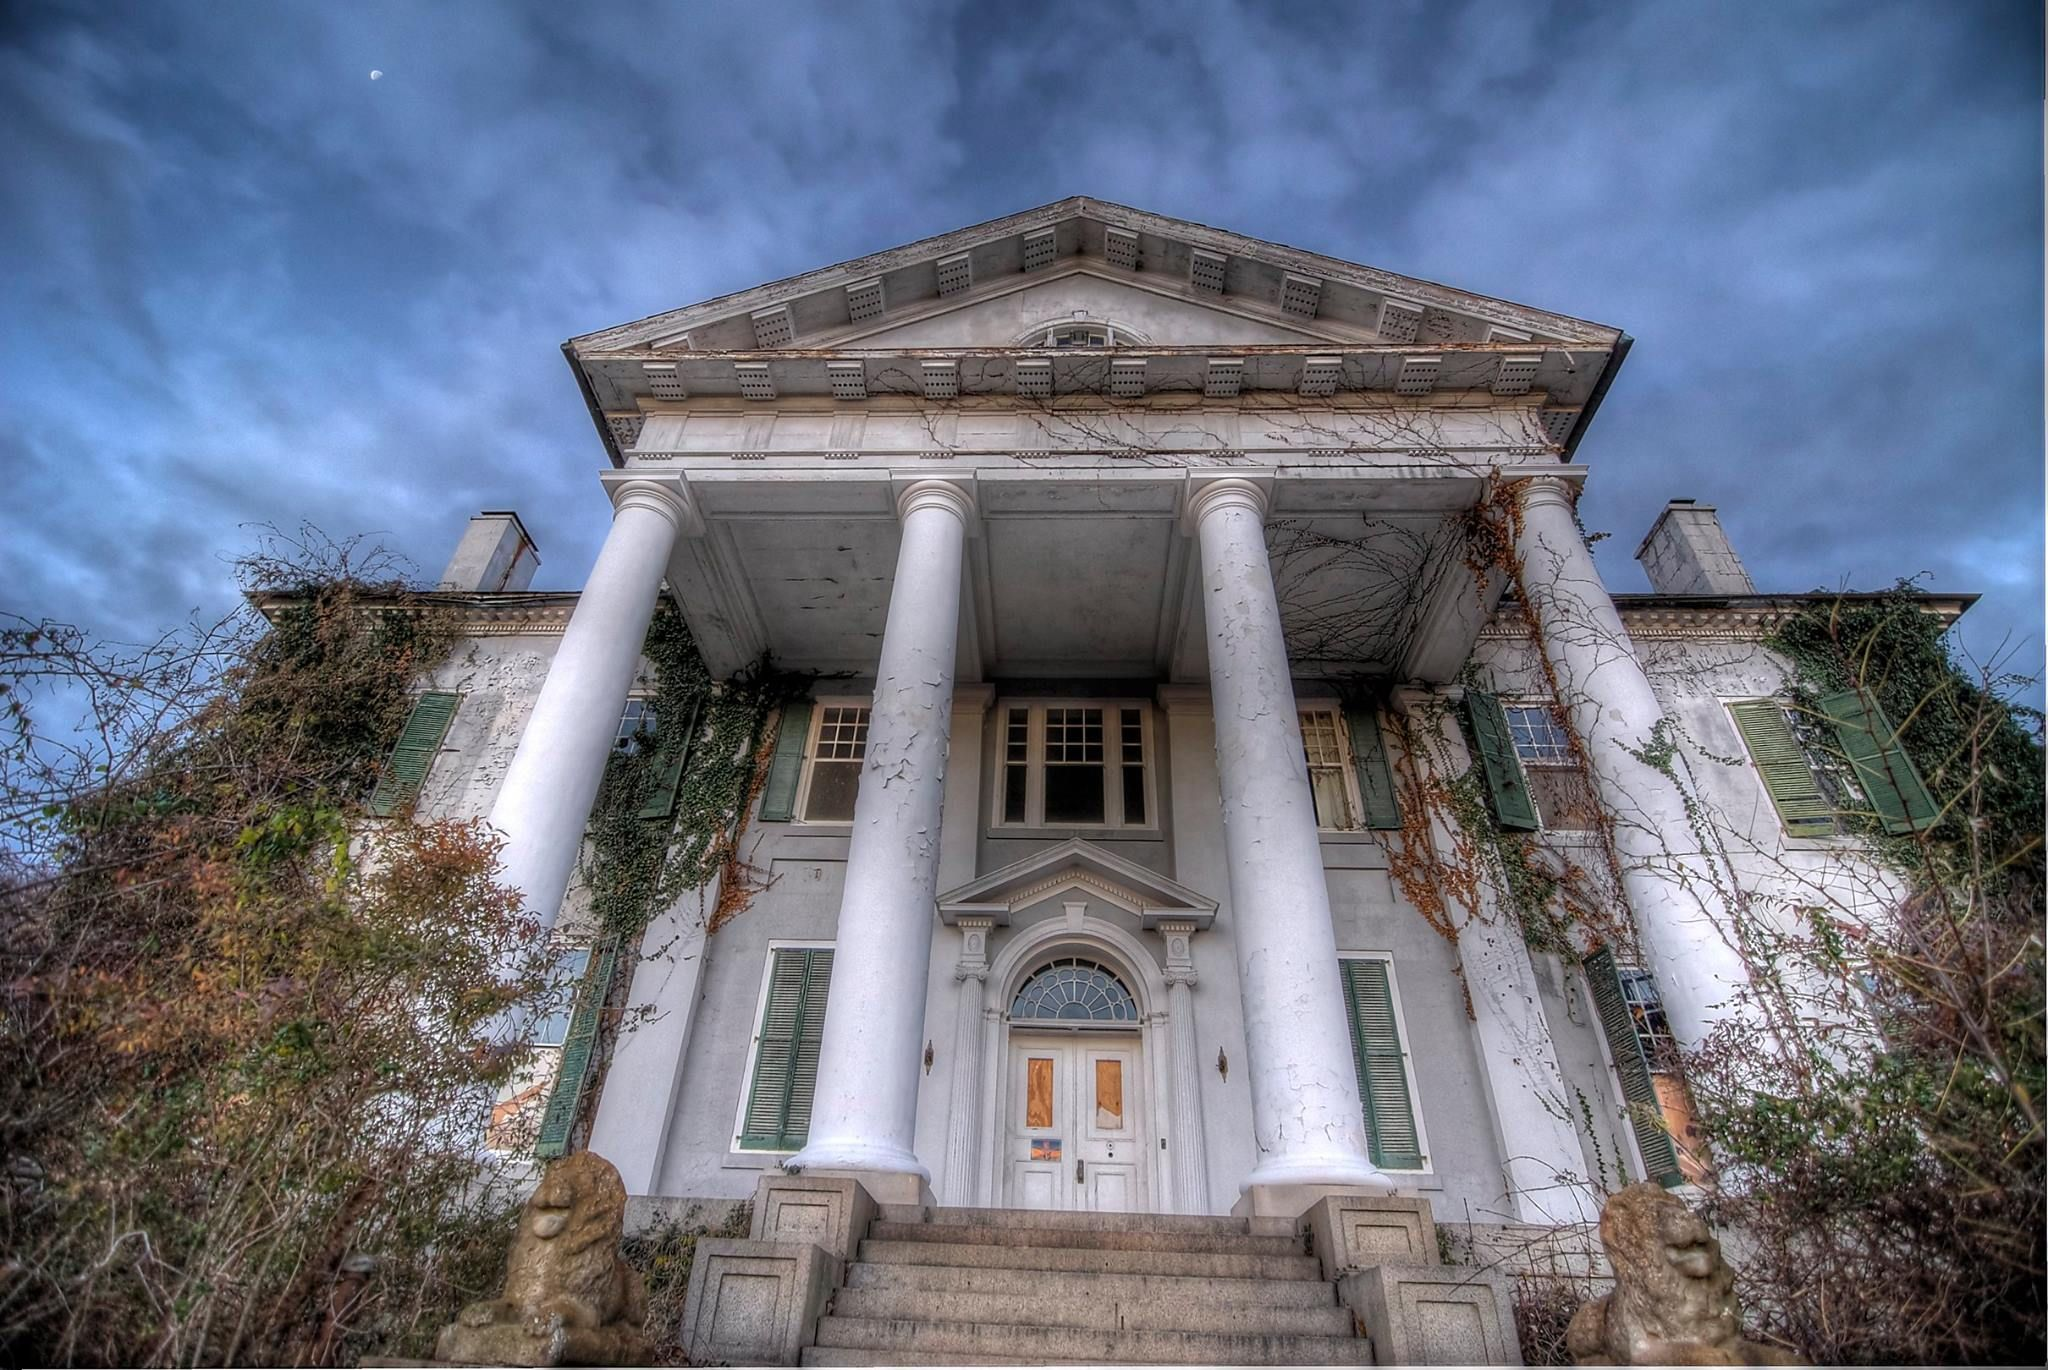 Abandoned Fairfax County School Buildings